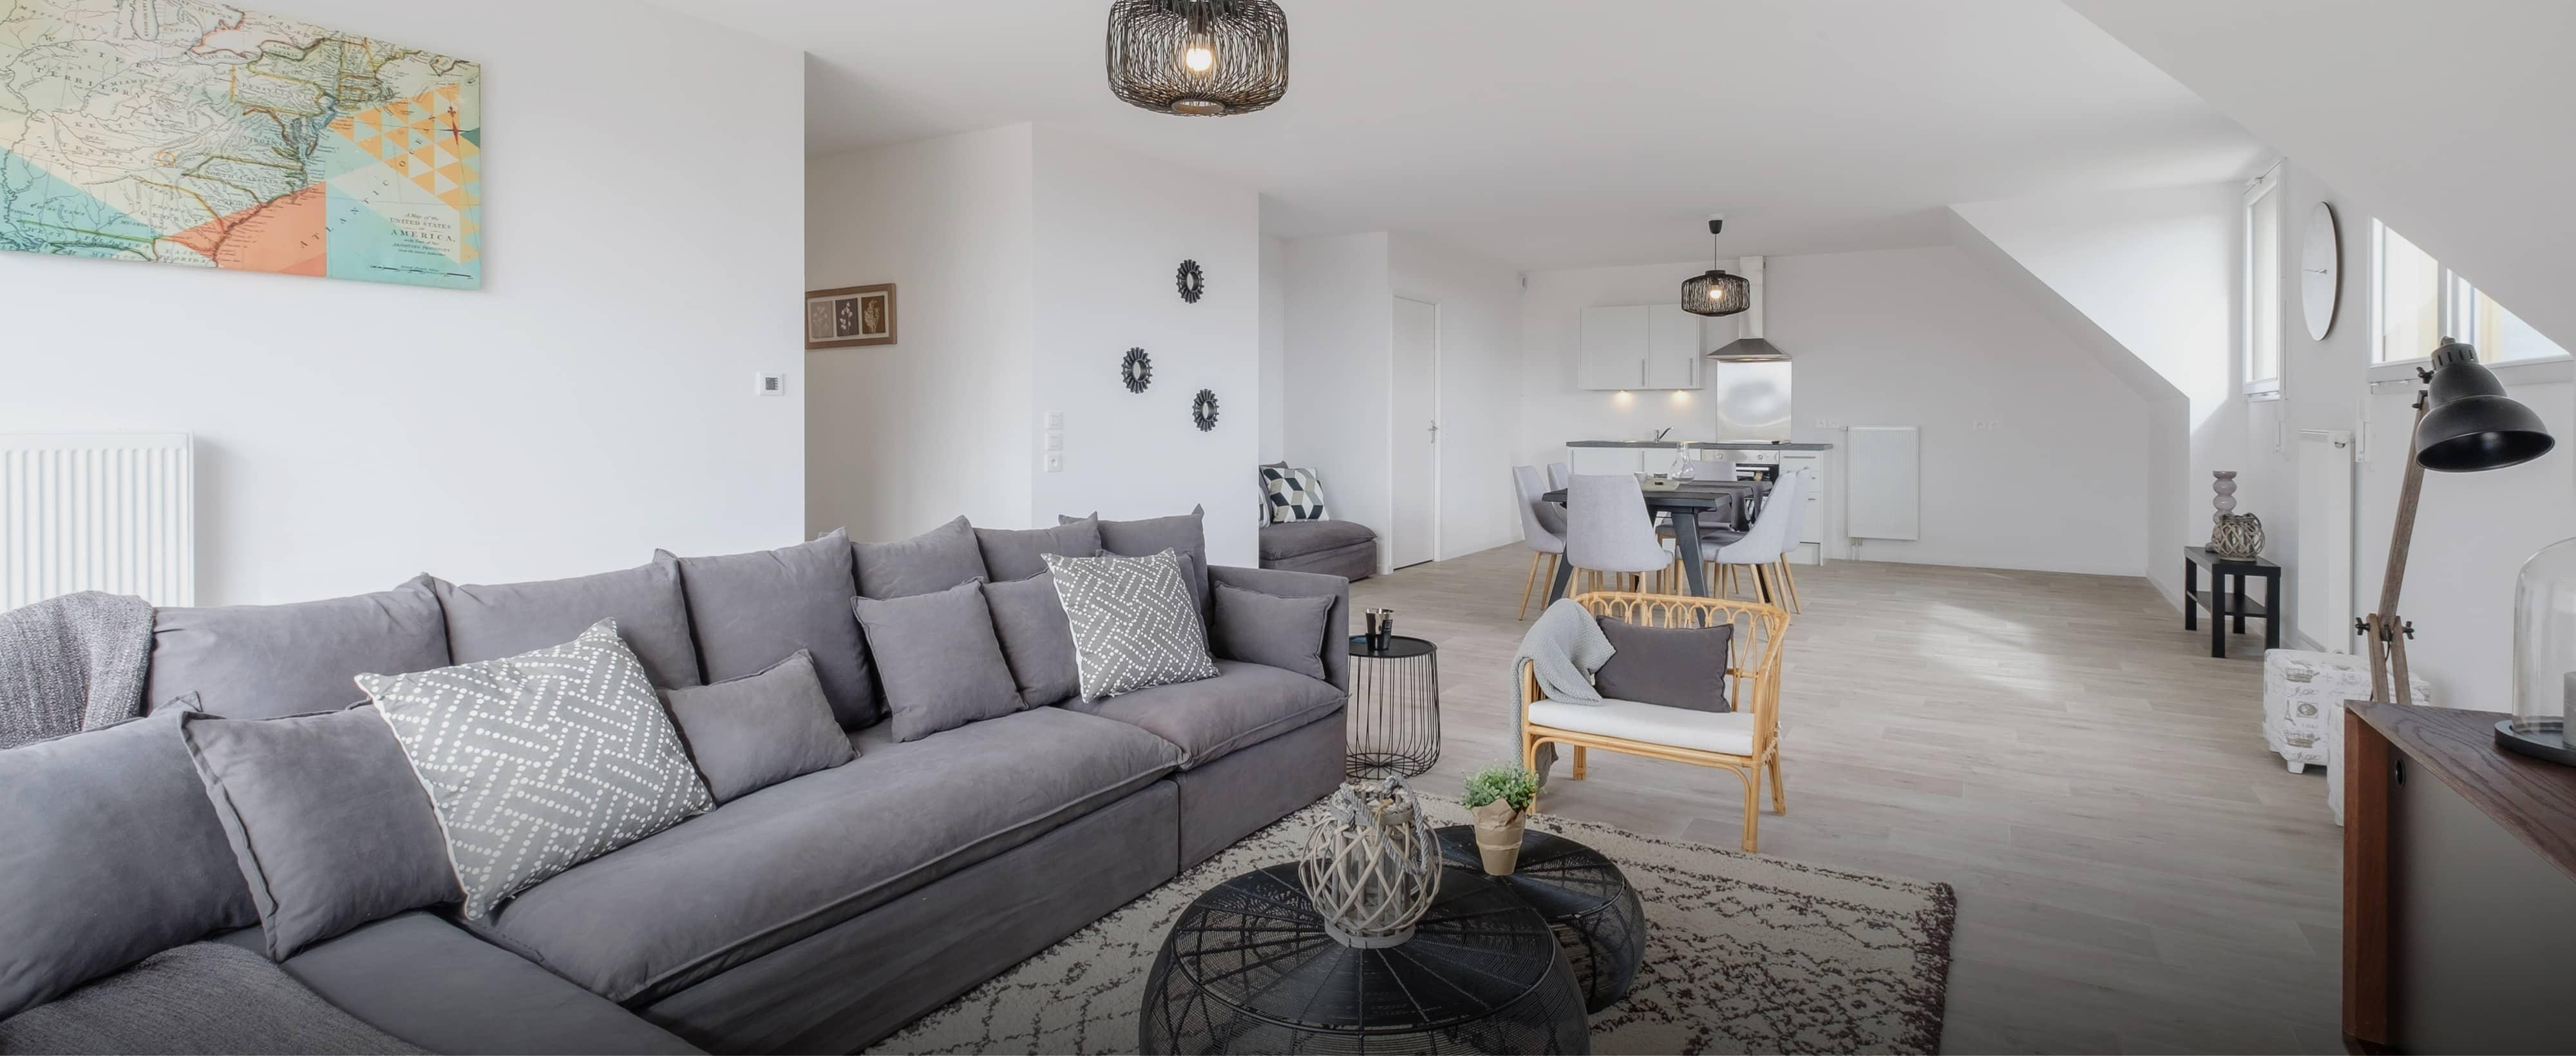 Quai 17 achat logement neuf valenciennes sigla neuf for Avantage achat appartement neuf